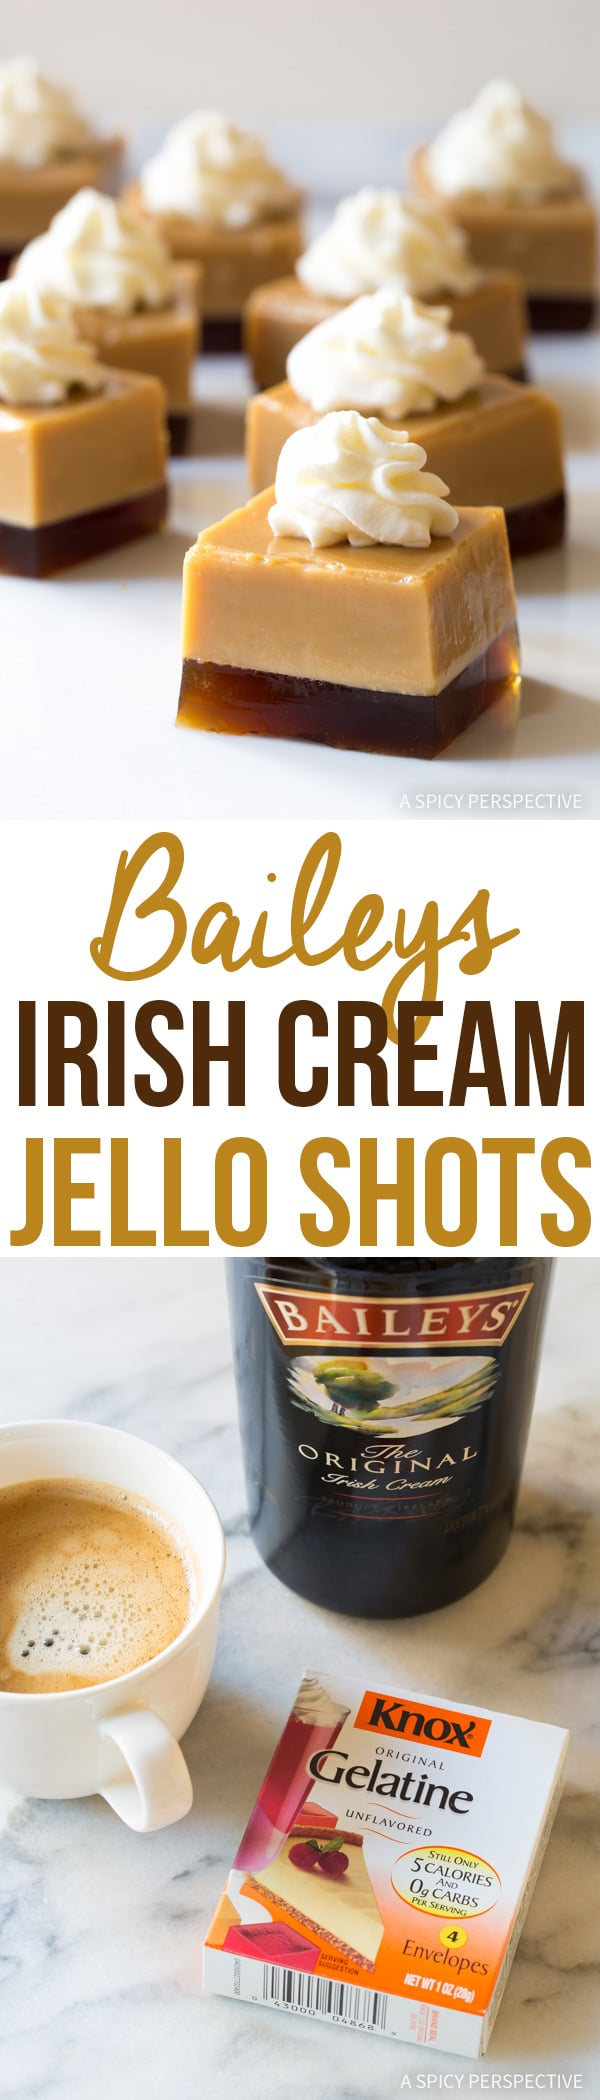 Baileys Irish Cream Jello Shots Recipe A Spicy Perspective